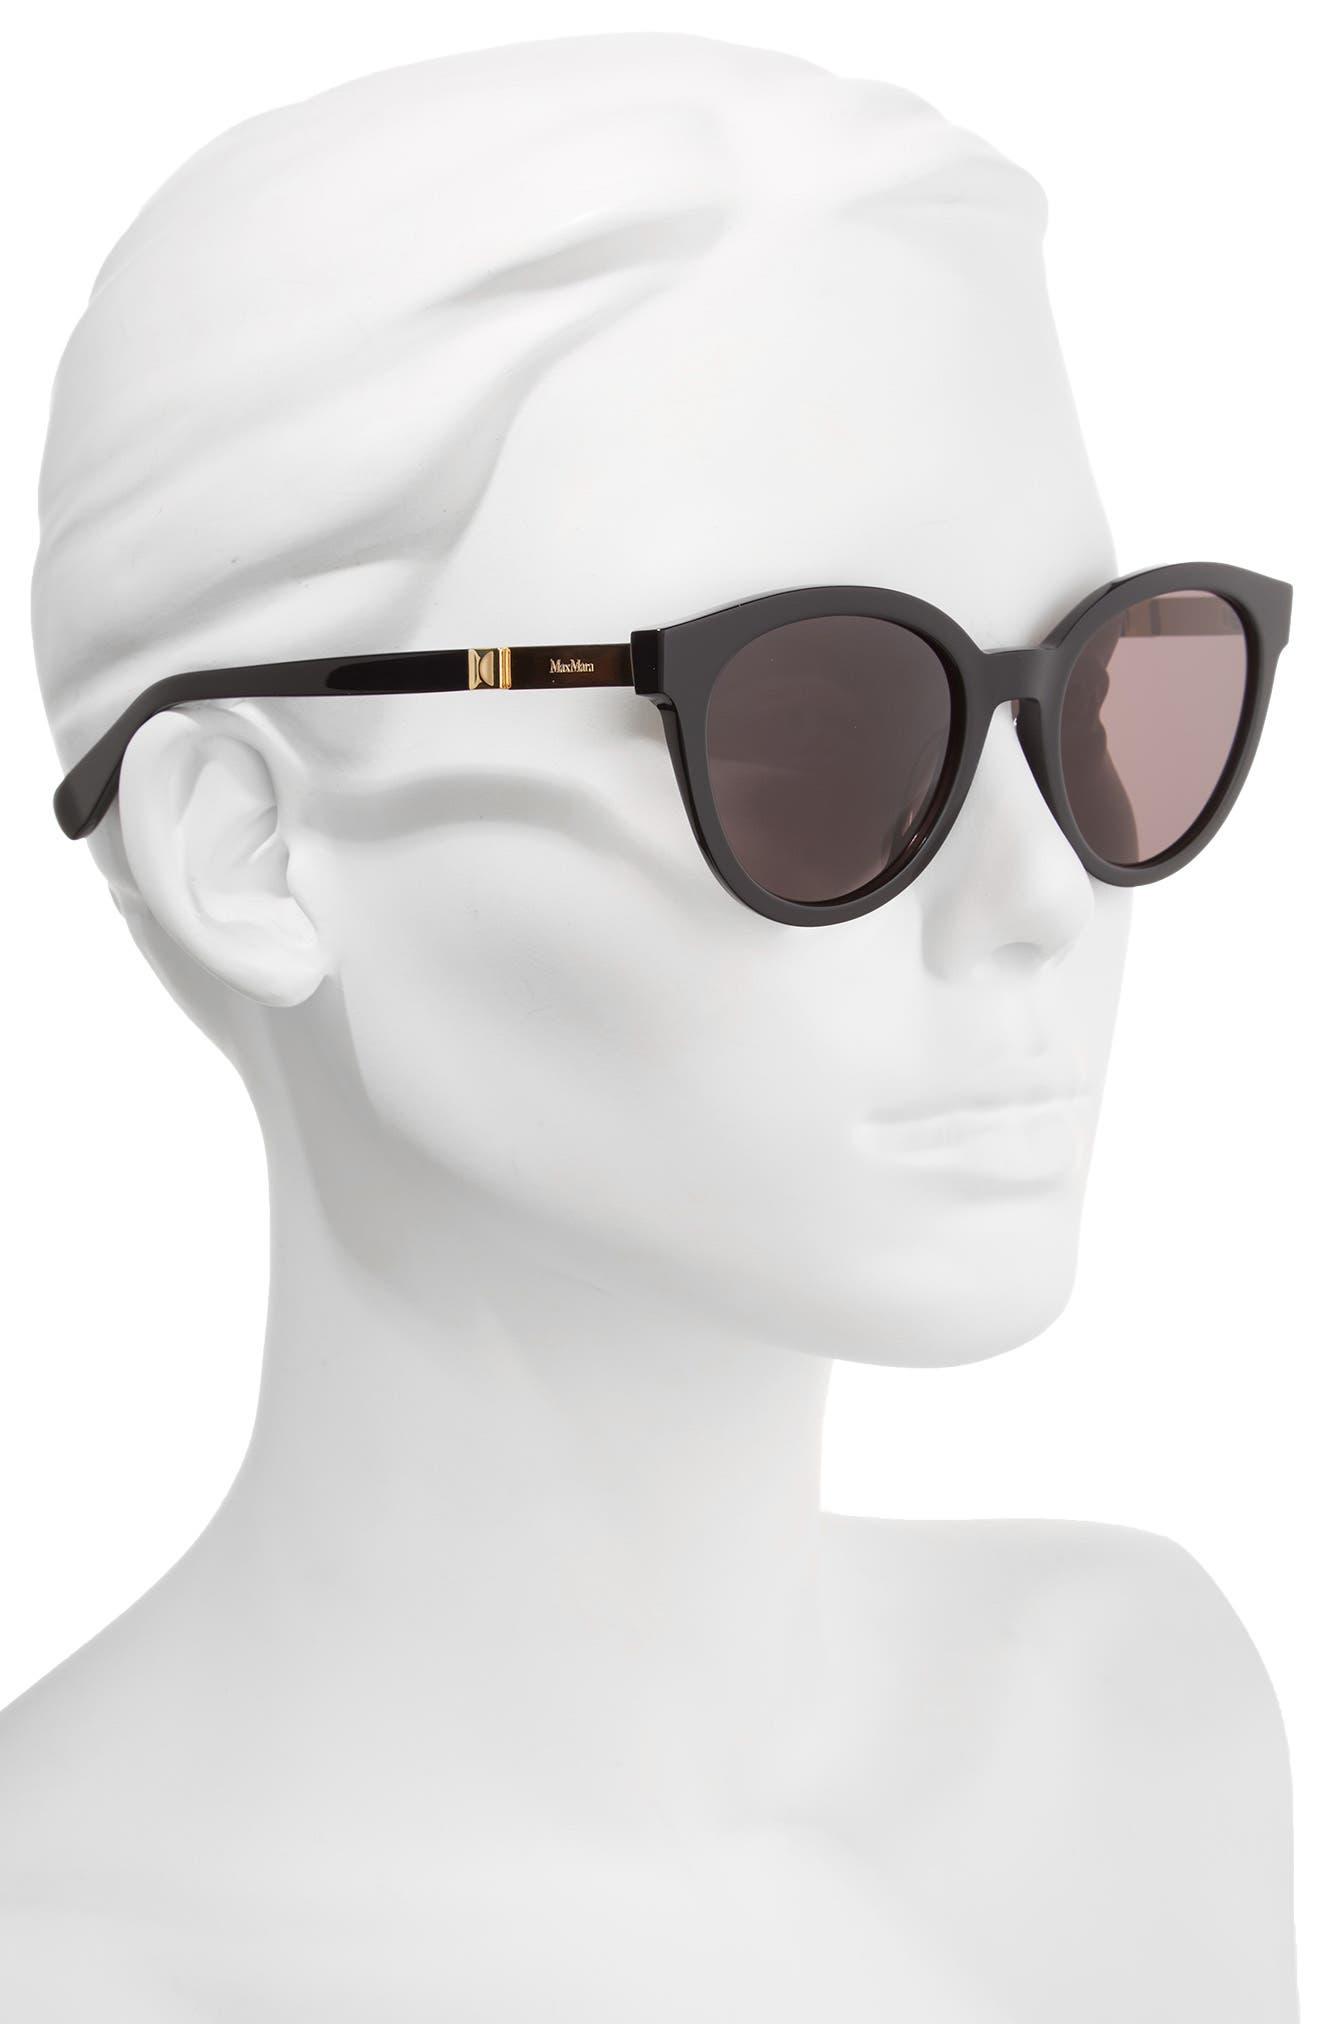 Gemini 52mm Cat Eye Sunglasses,                             Alternate thumbnail 2, color,                             001